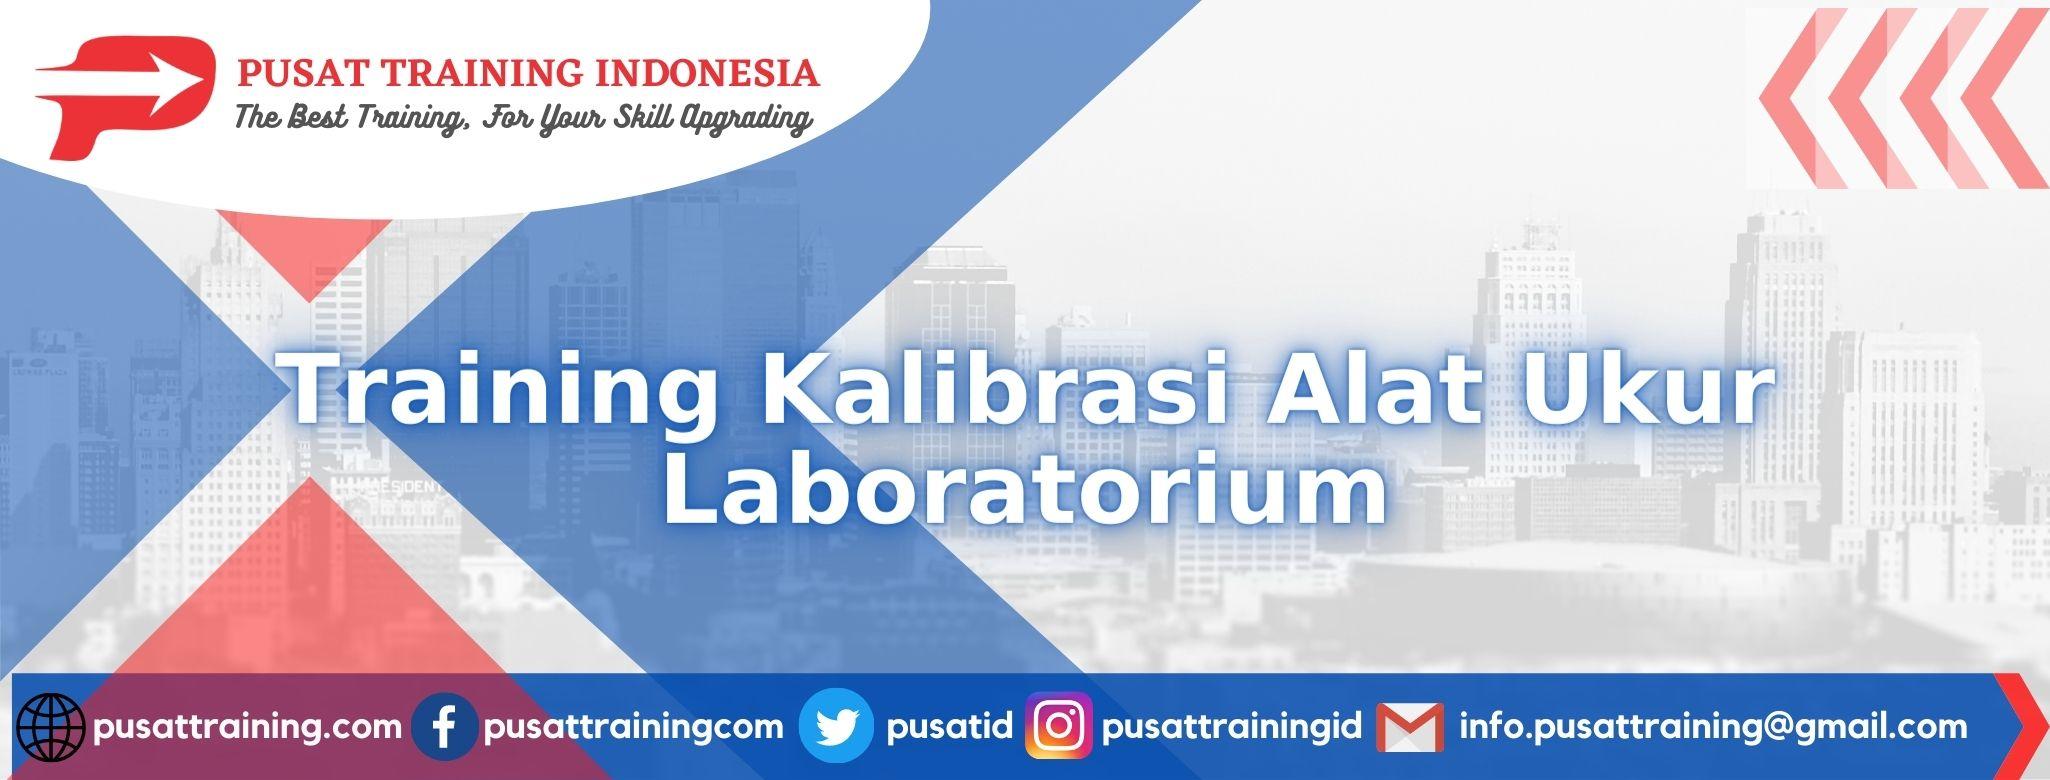 Training-Kalibrasi-Alat-Ukur-Laboratorium